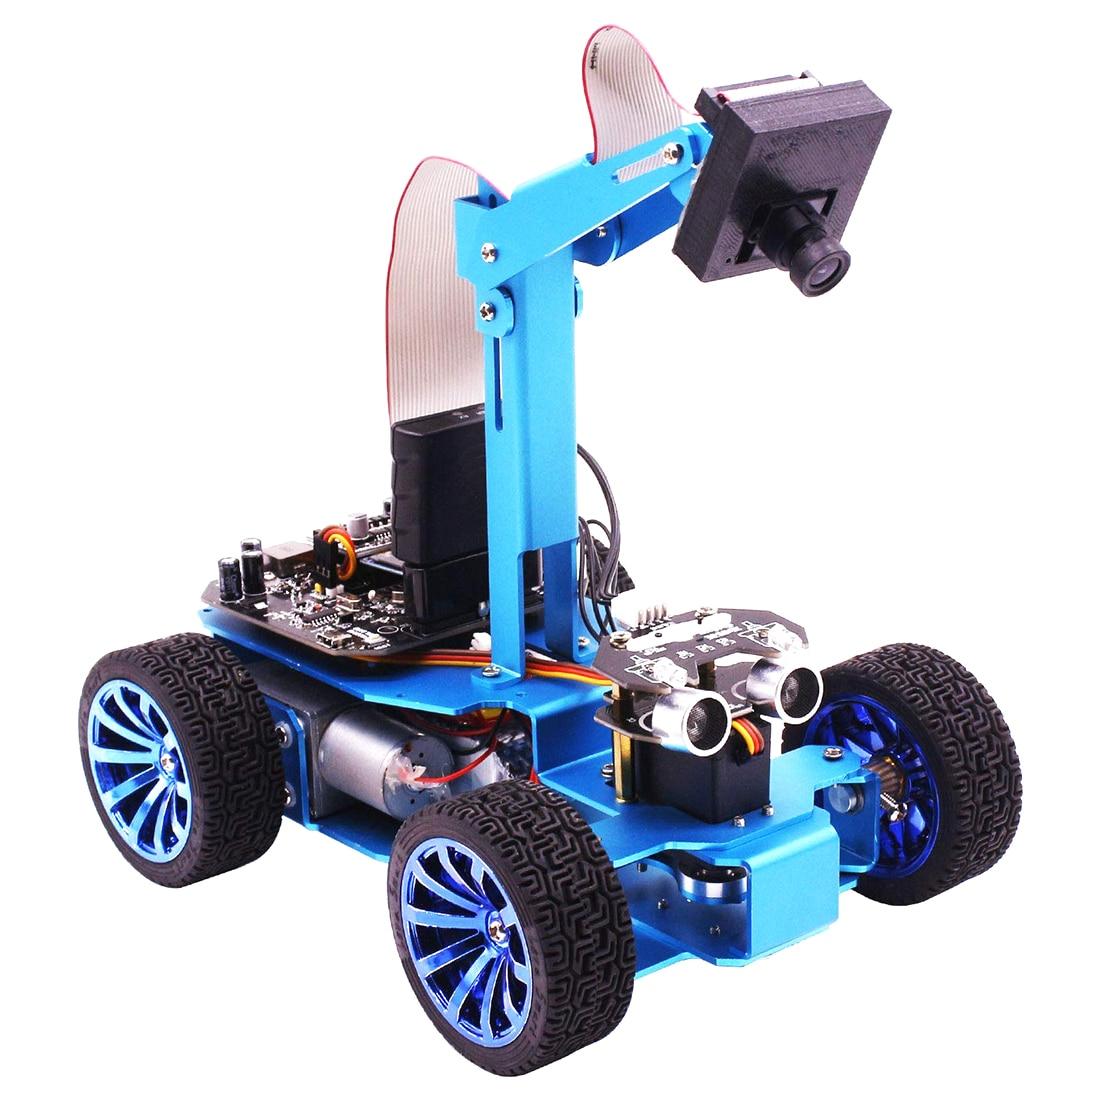 Hot STM32 Visual Robot OV7670 Camera Tracking OLED Screen Independent Steering Robotics High-Power Motor For Children Kids Toys